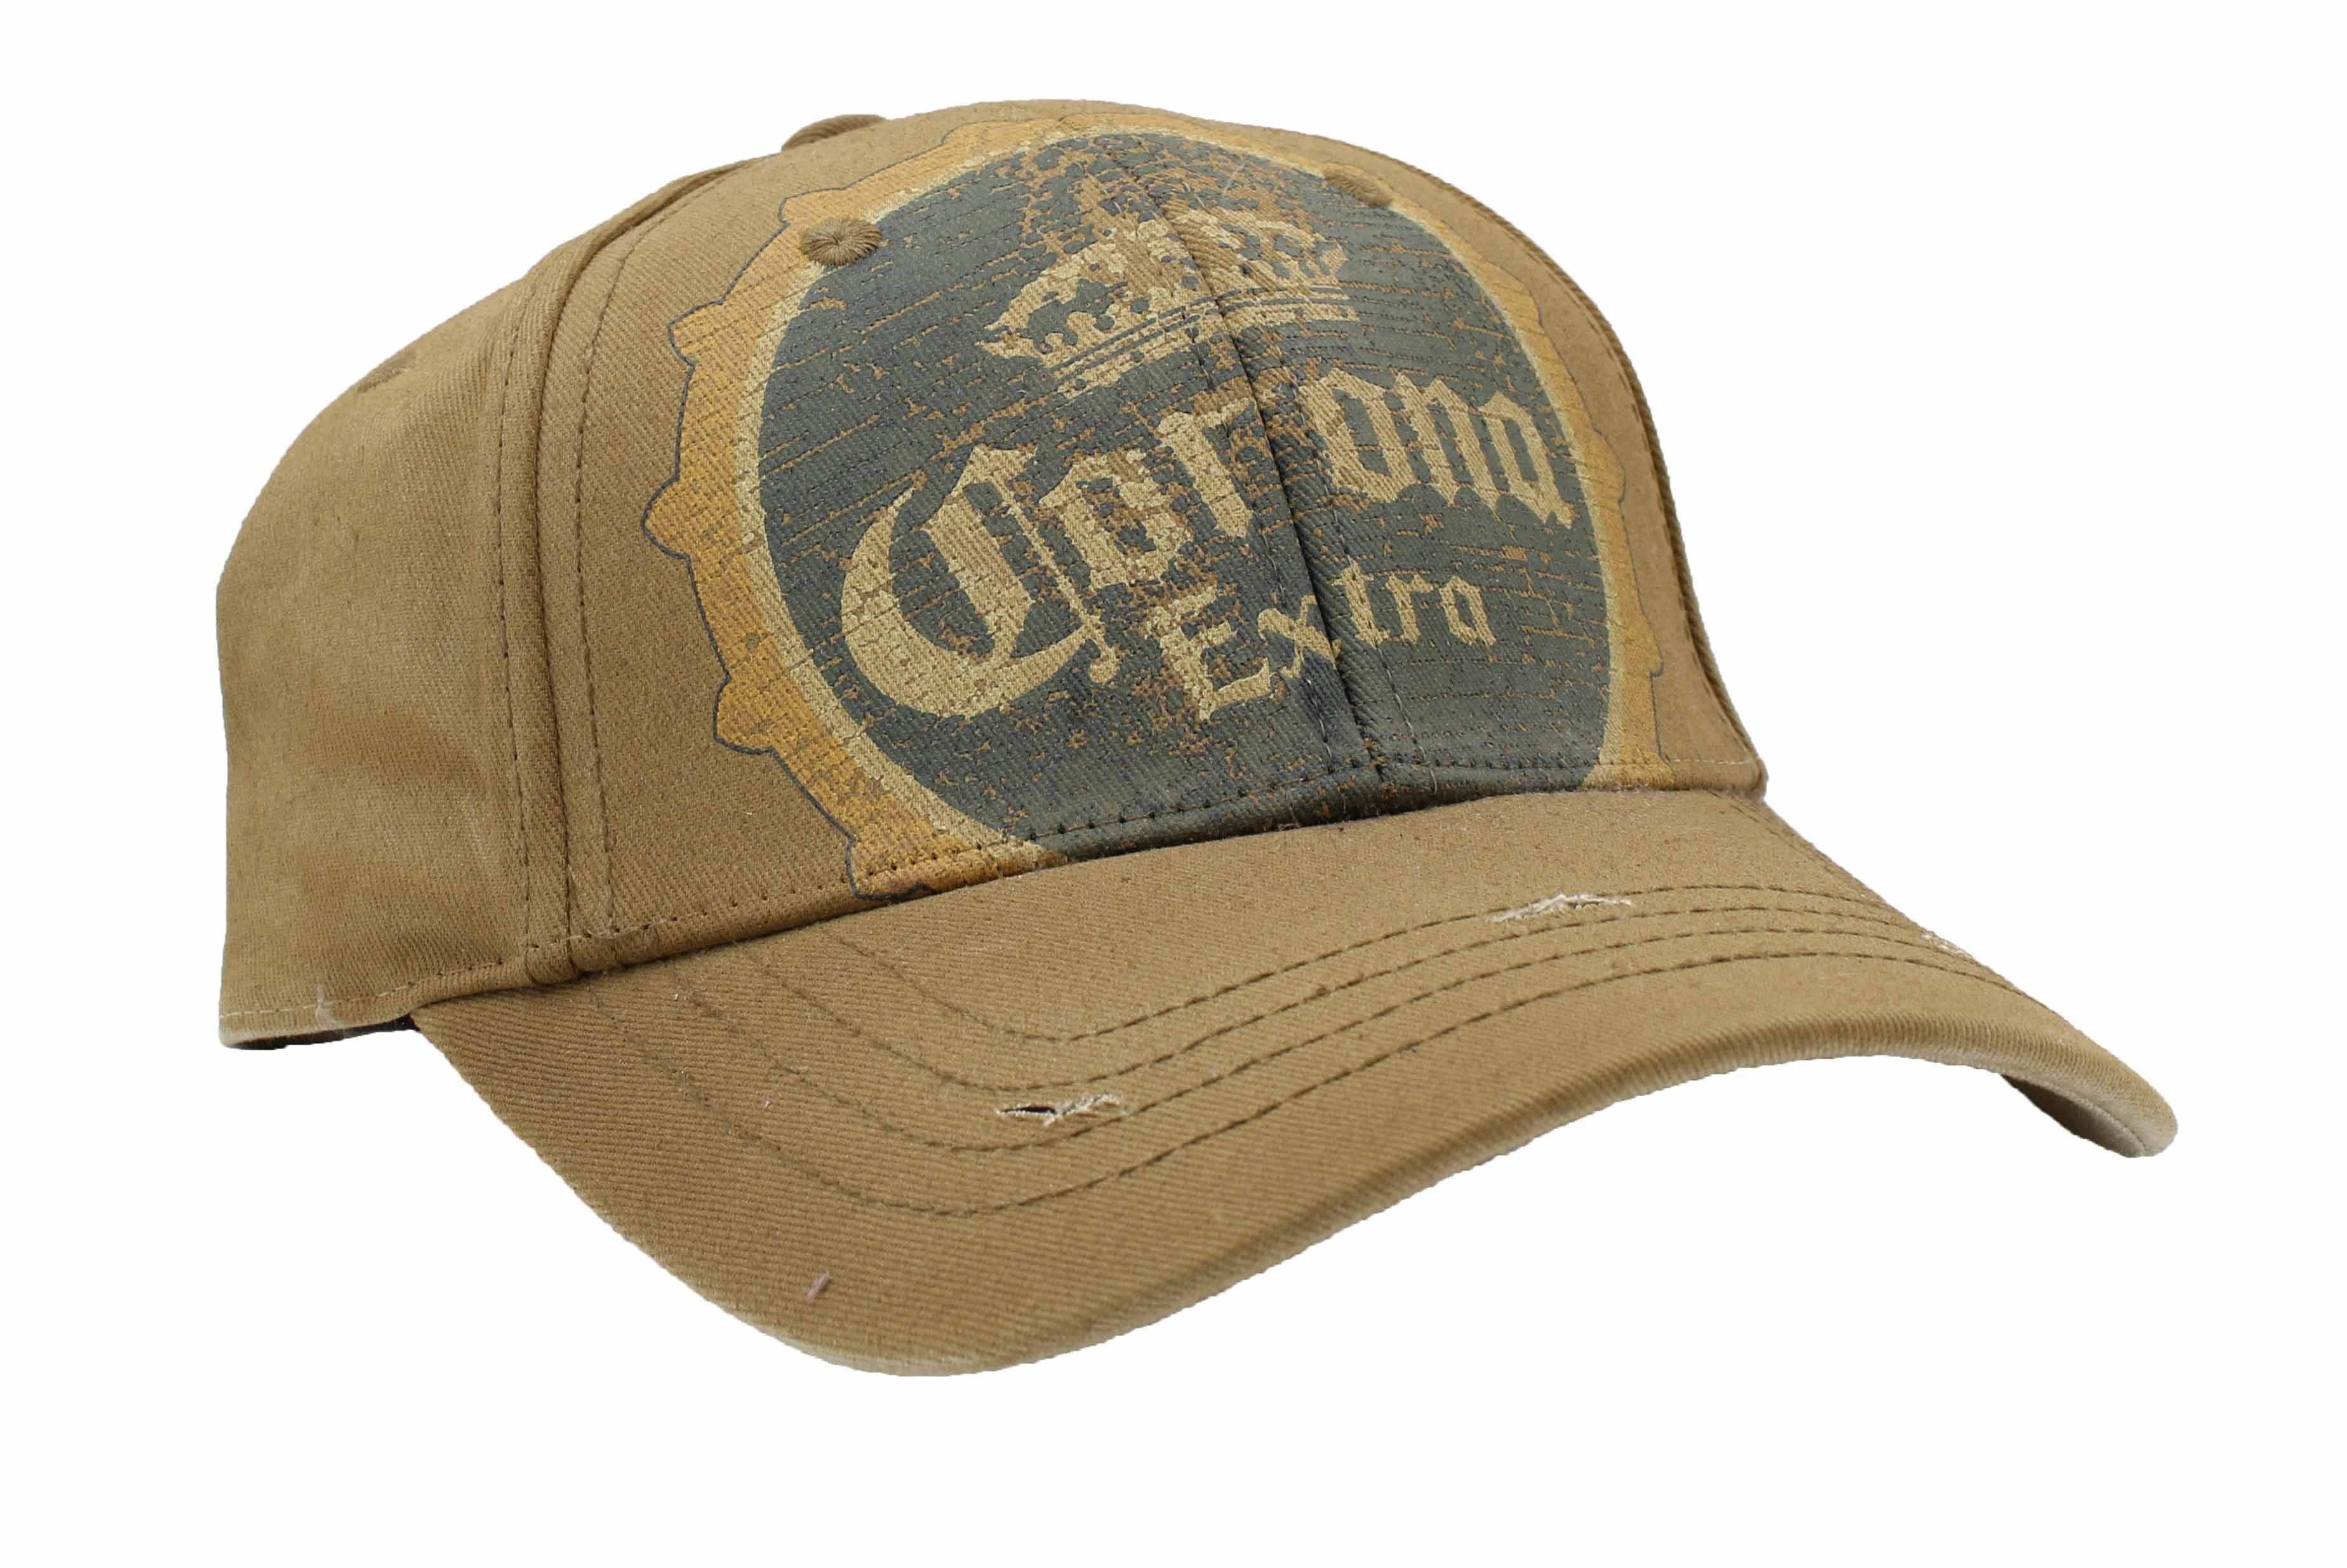 b45212ffbed Corona - Corona Extra Mens Adjustable Strapback Baseball Cap (Brown Vintage)  - Walmart.com